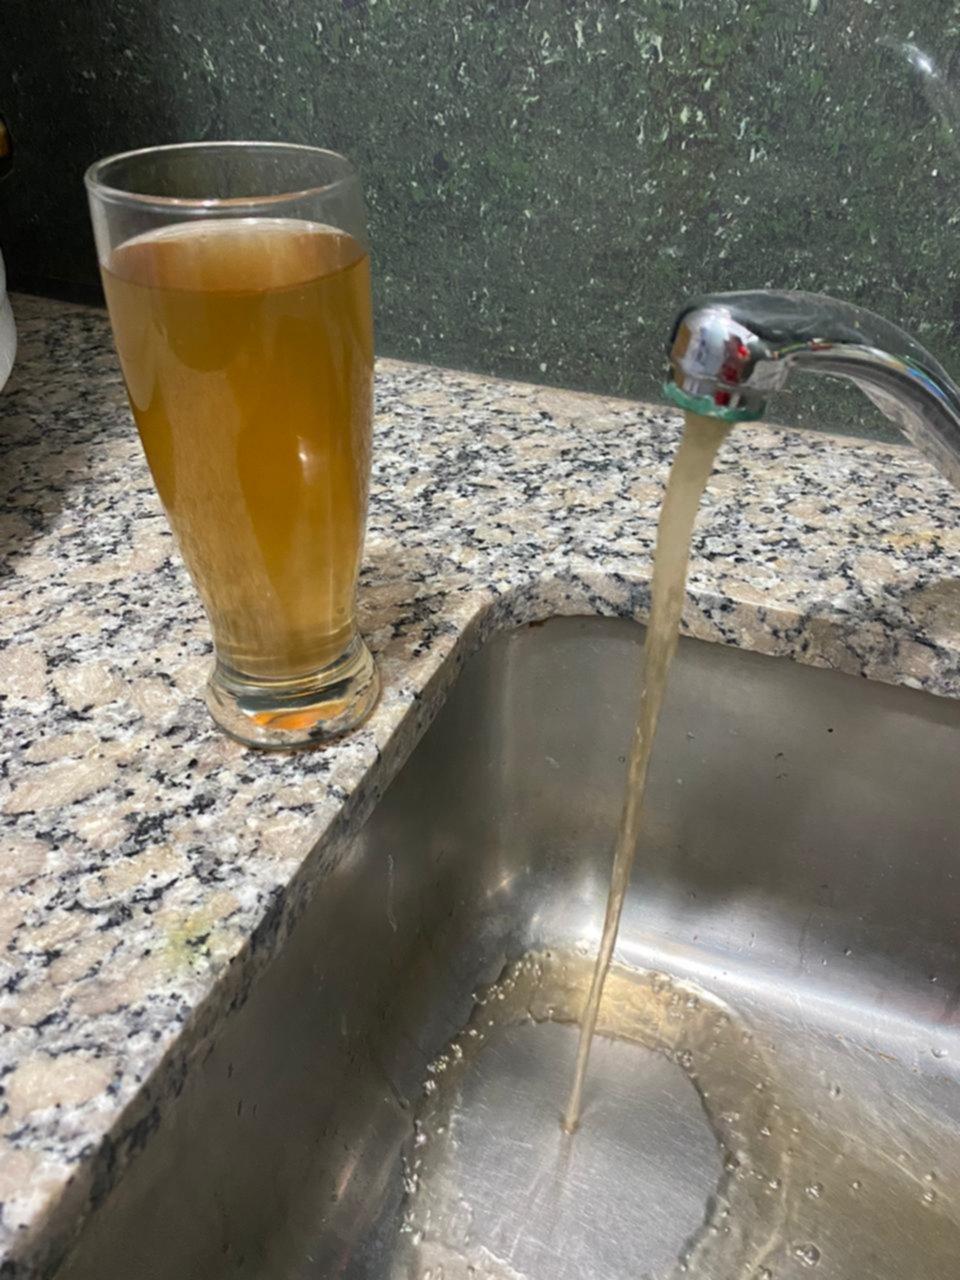 "Del agua turbia a las canillas secas, otra ""catarata"" de quejas contra Absa"